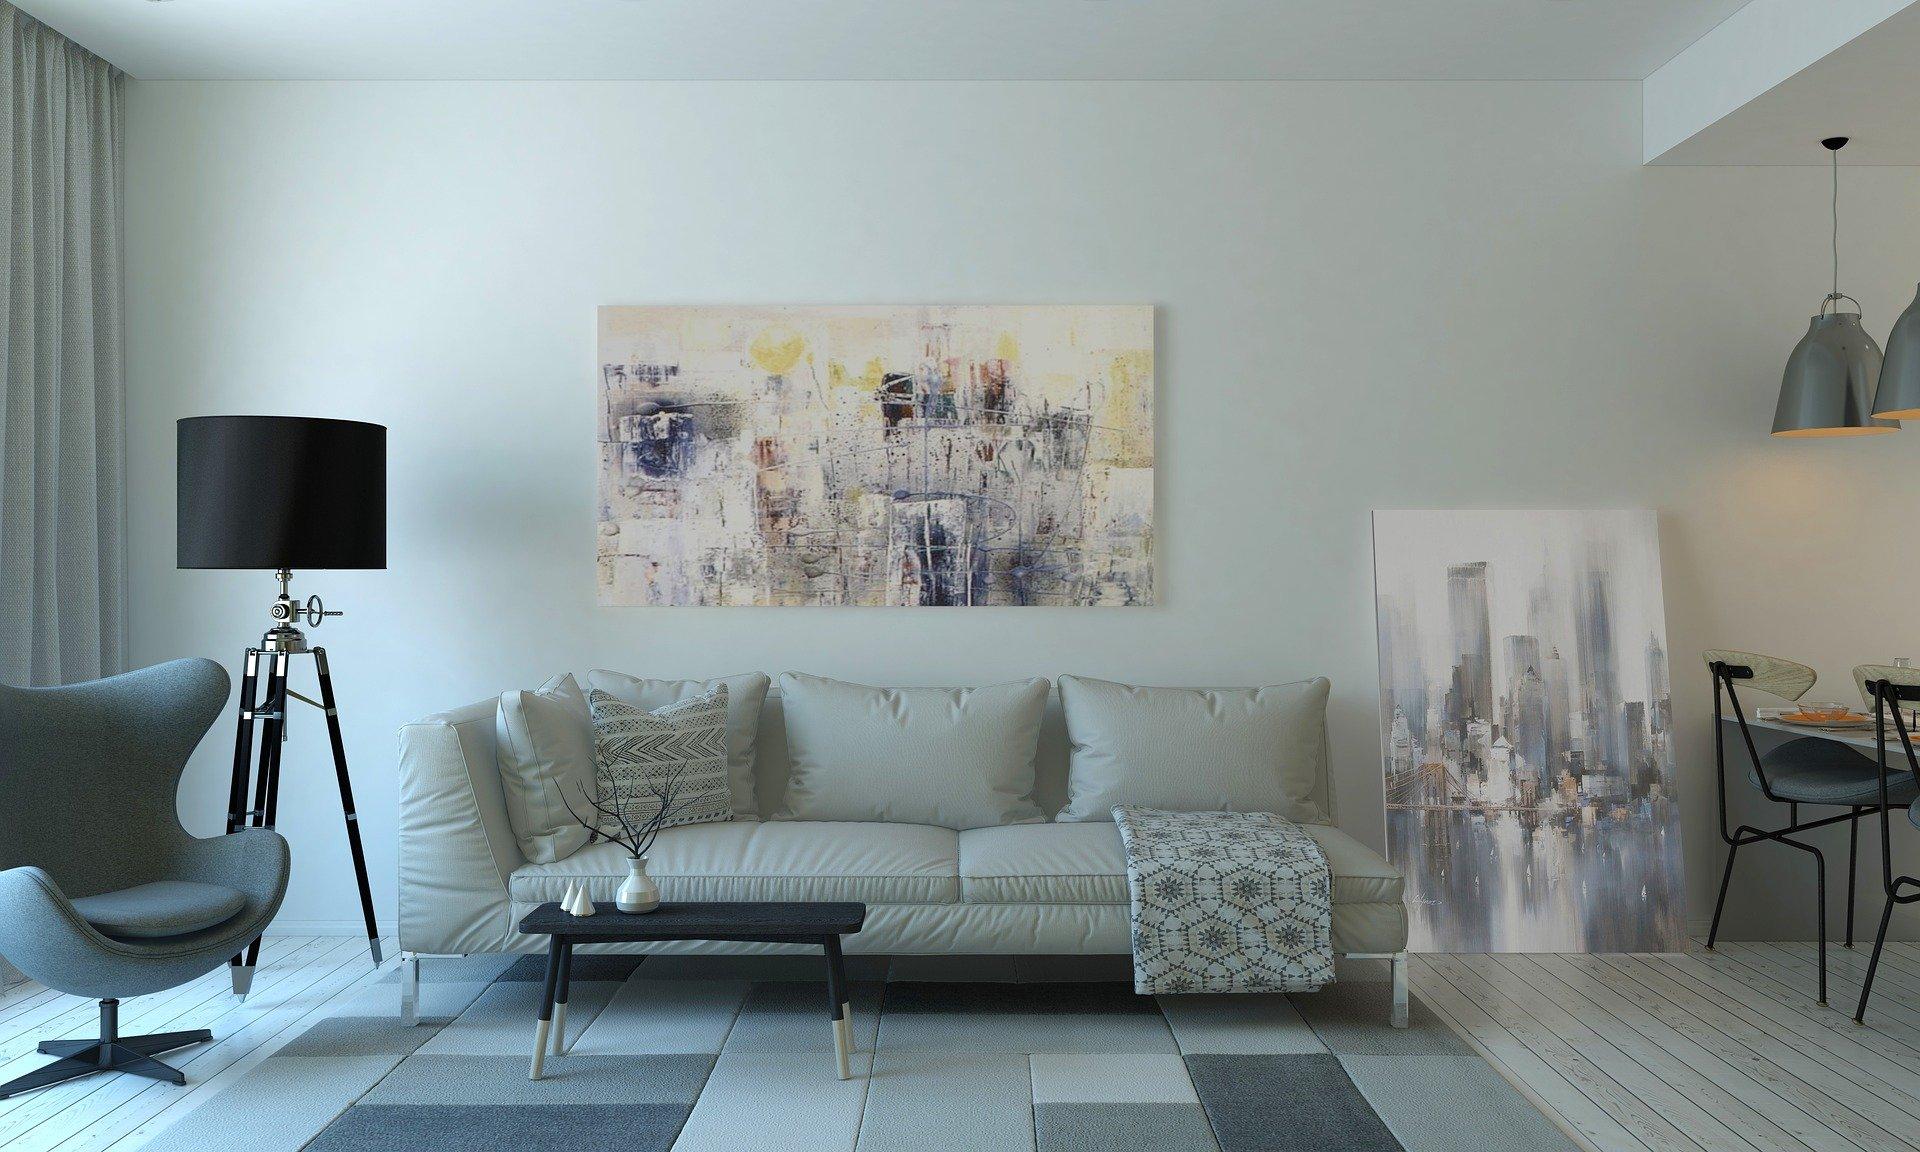 living-room-1835923_1920